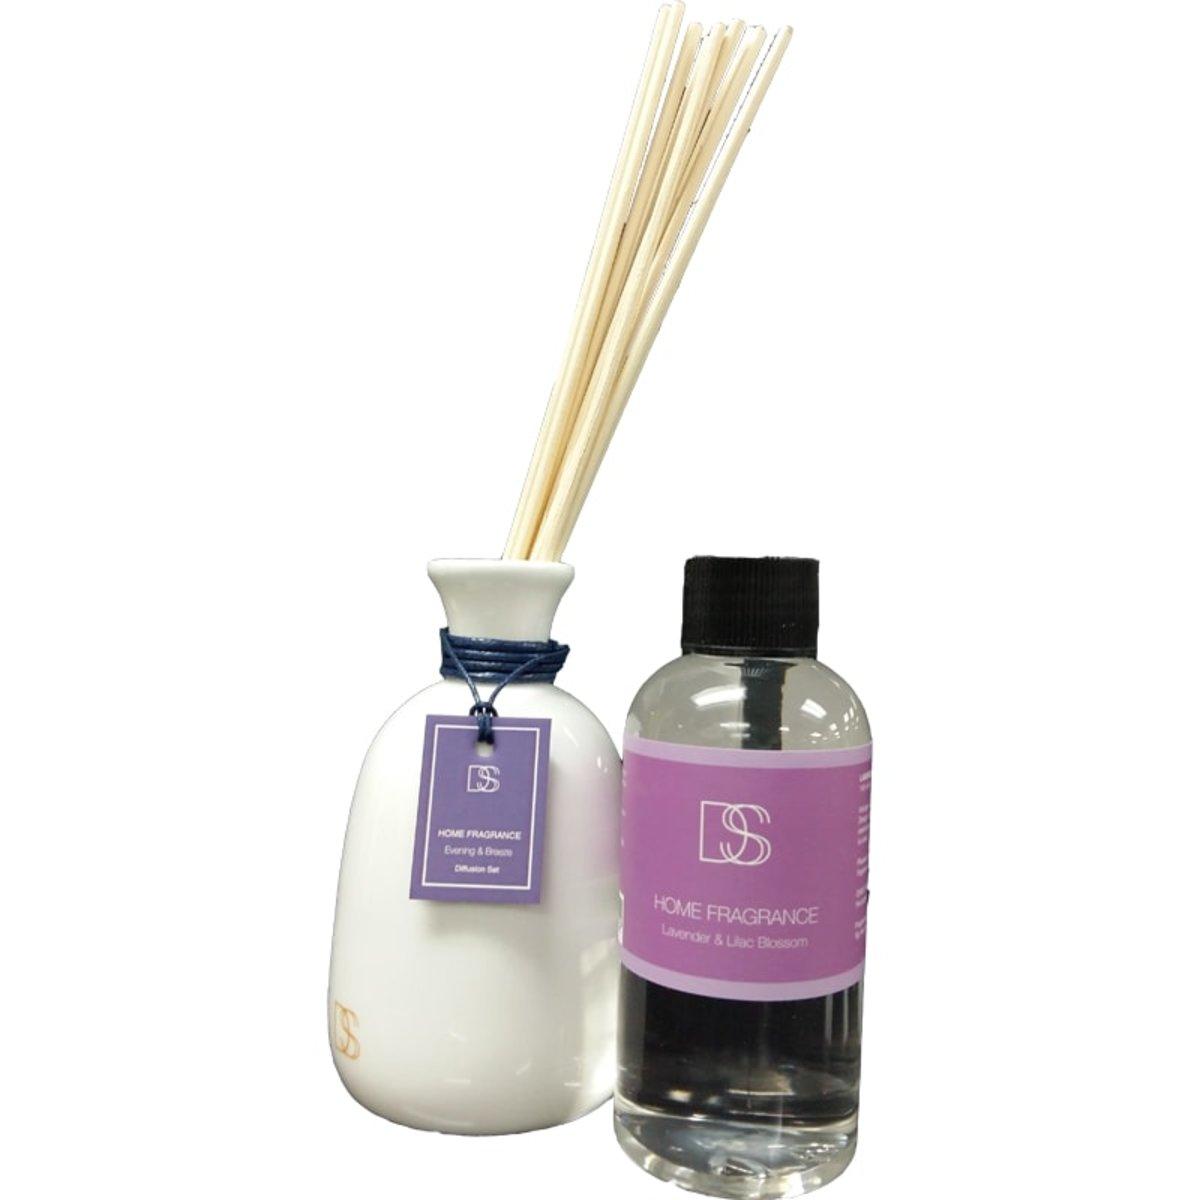 DSS Lavender and Lilac Blossom Diffuser 丁香花香薰 薰衣草 145ml 紫色